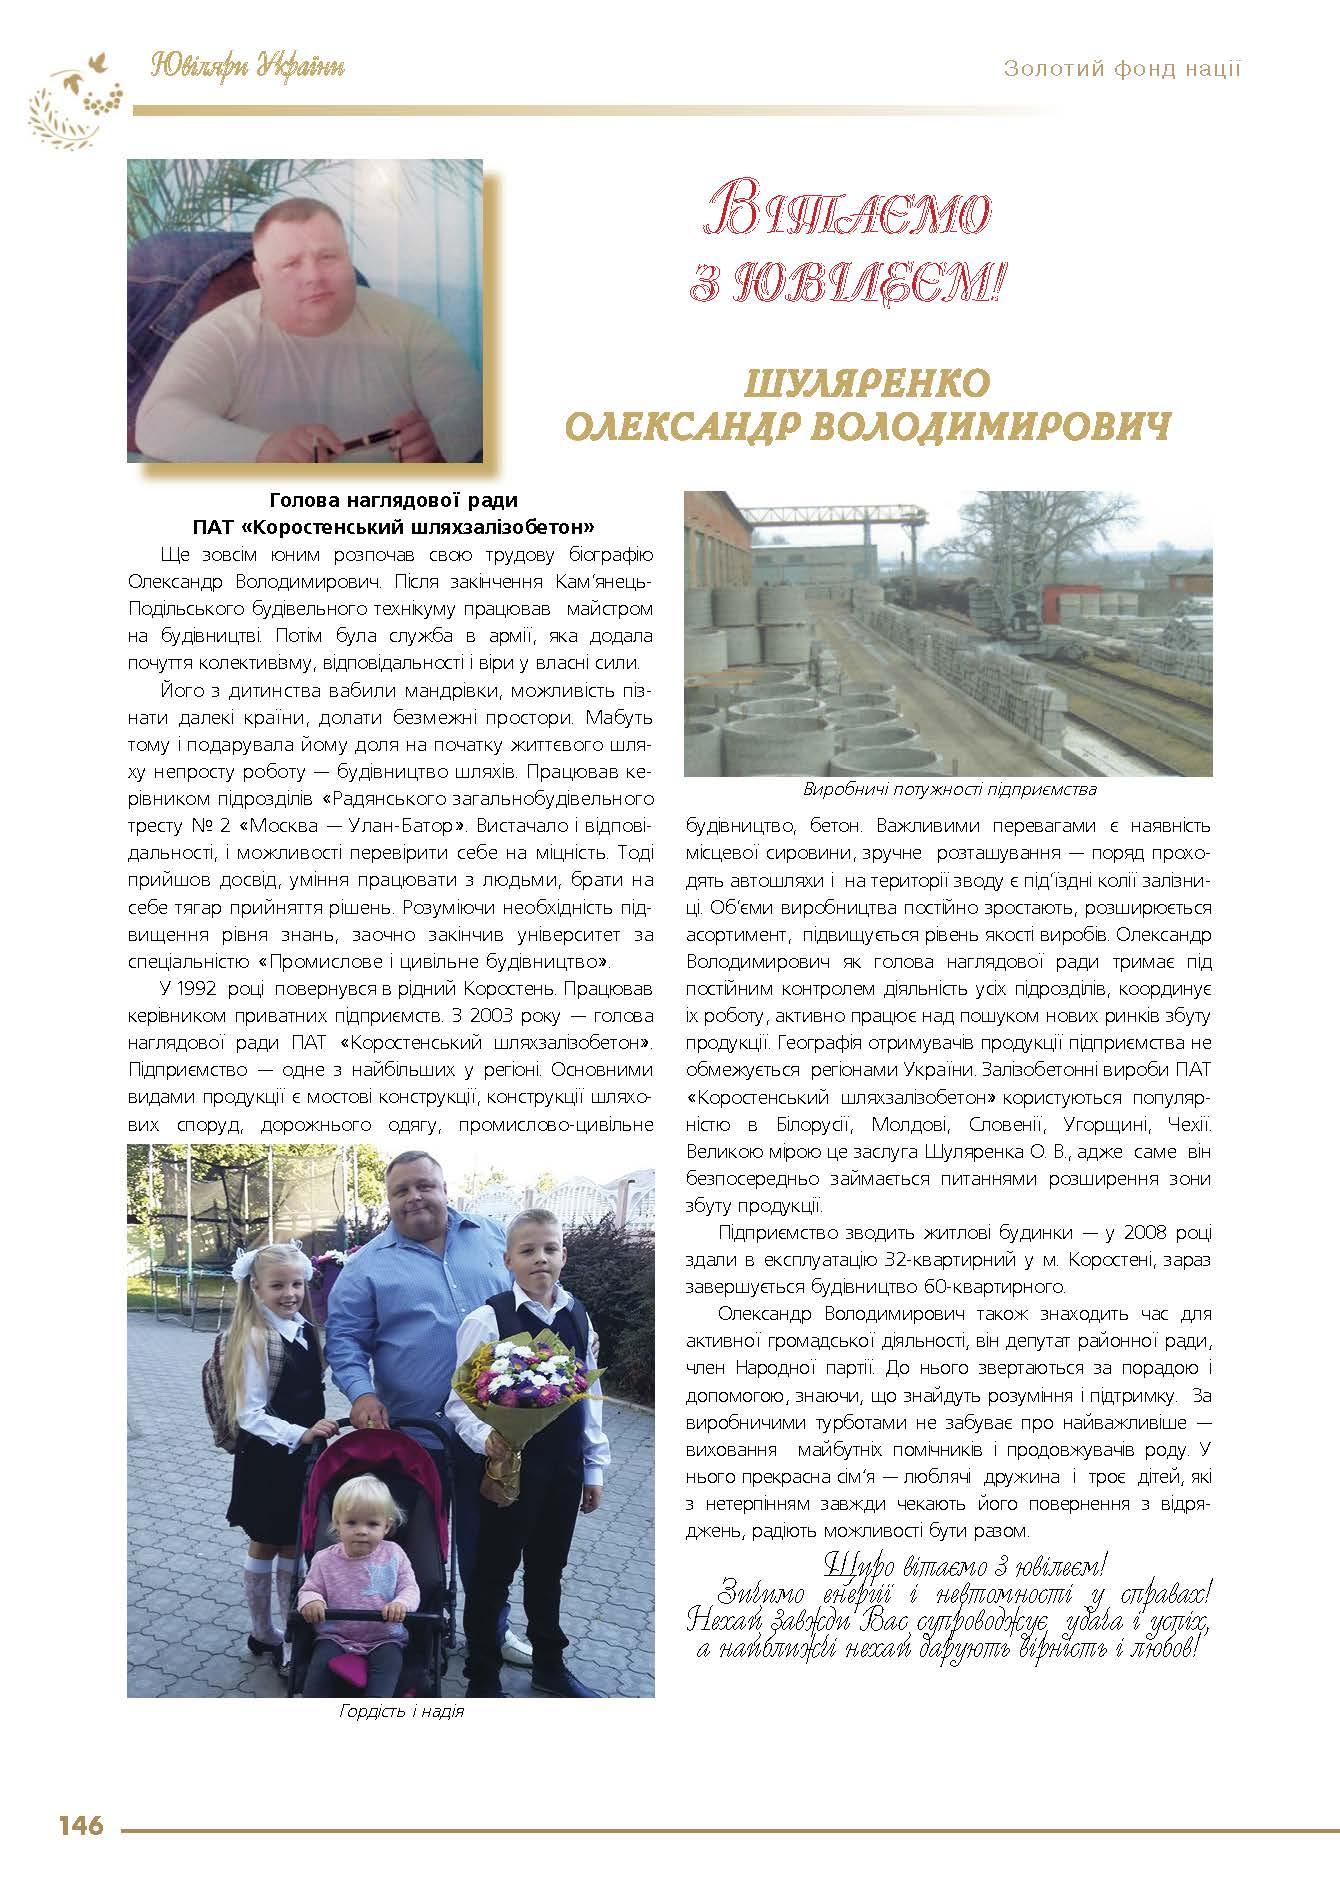 Шуляренко Олександр Володимирович